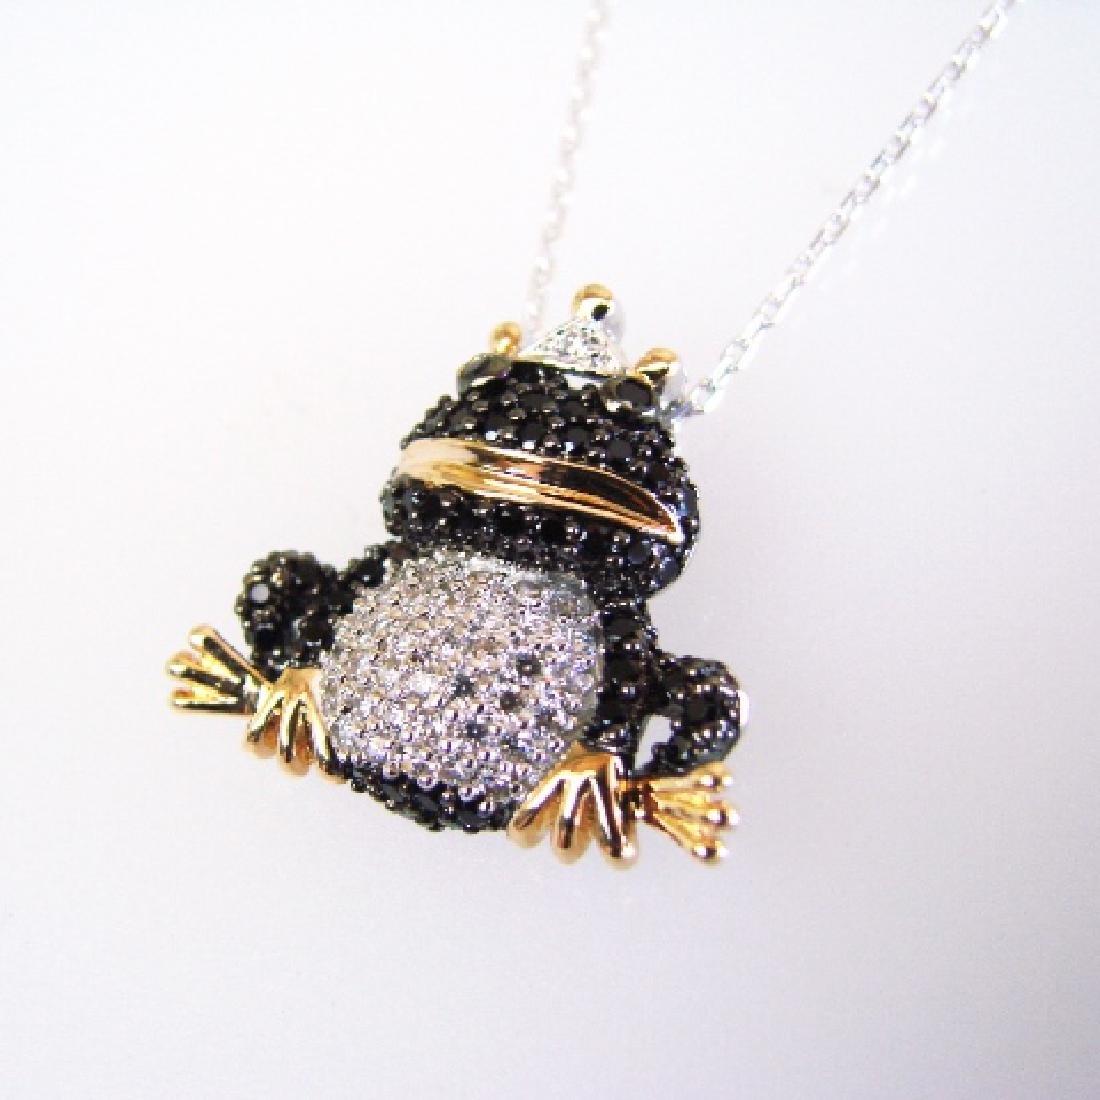 Creation Diamond W/B 1.23 CT Necklace 18k Y/G Overlay - 2